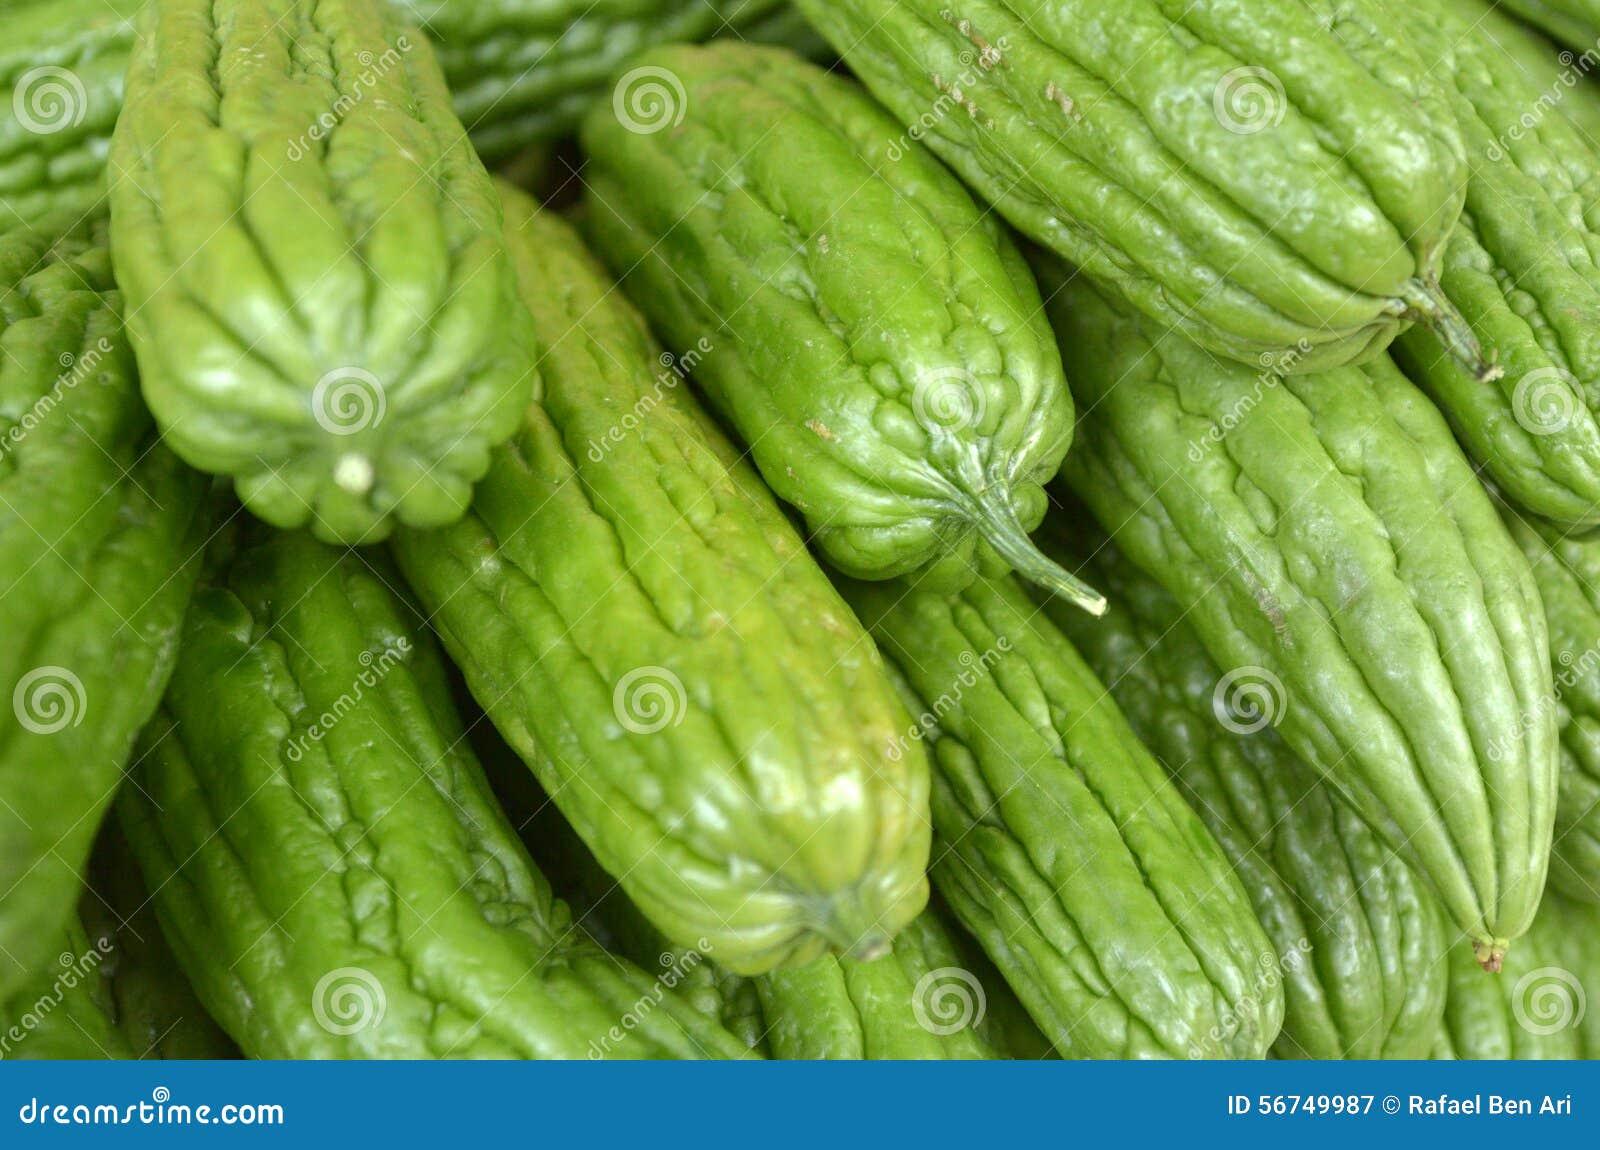 Why bitter cucumbers 98